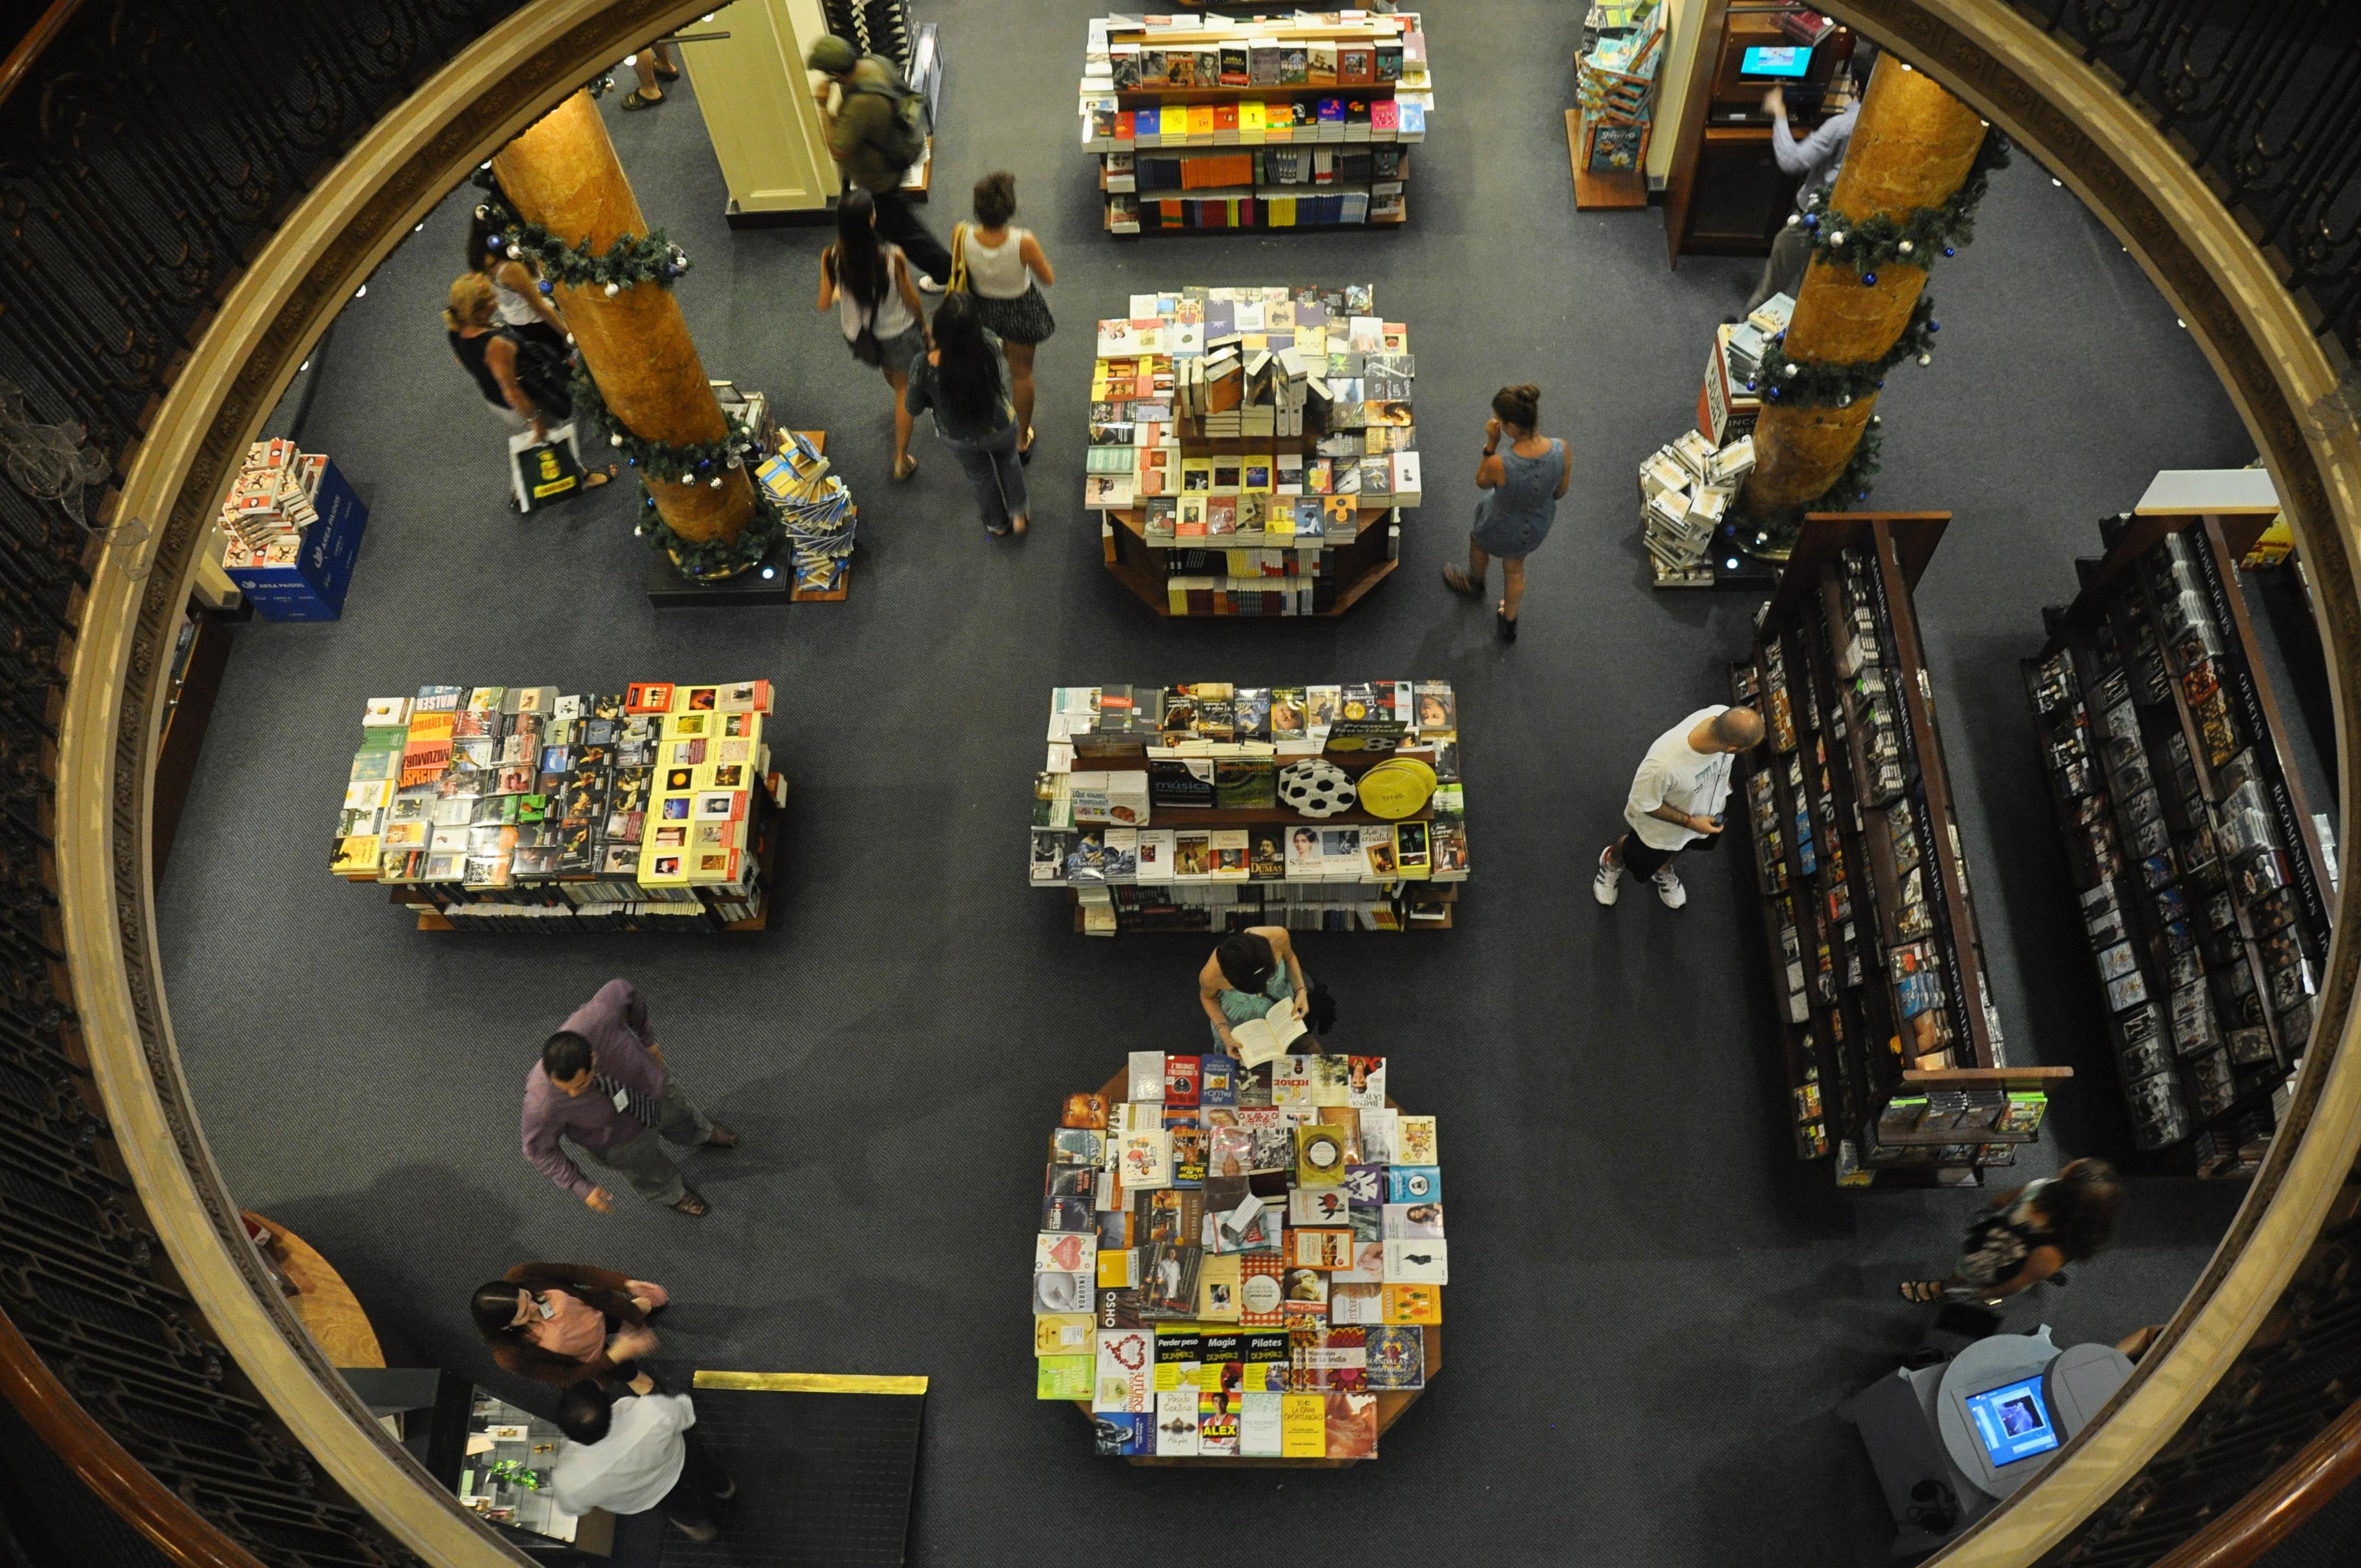 El-Ateneo-Interior-Celine bookstore